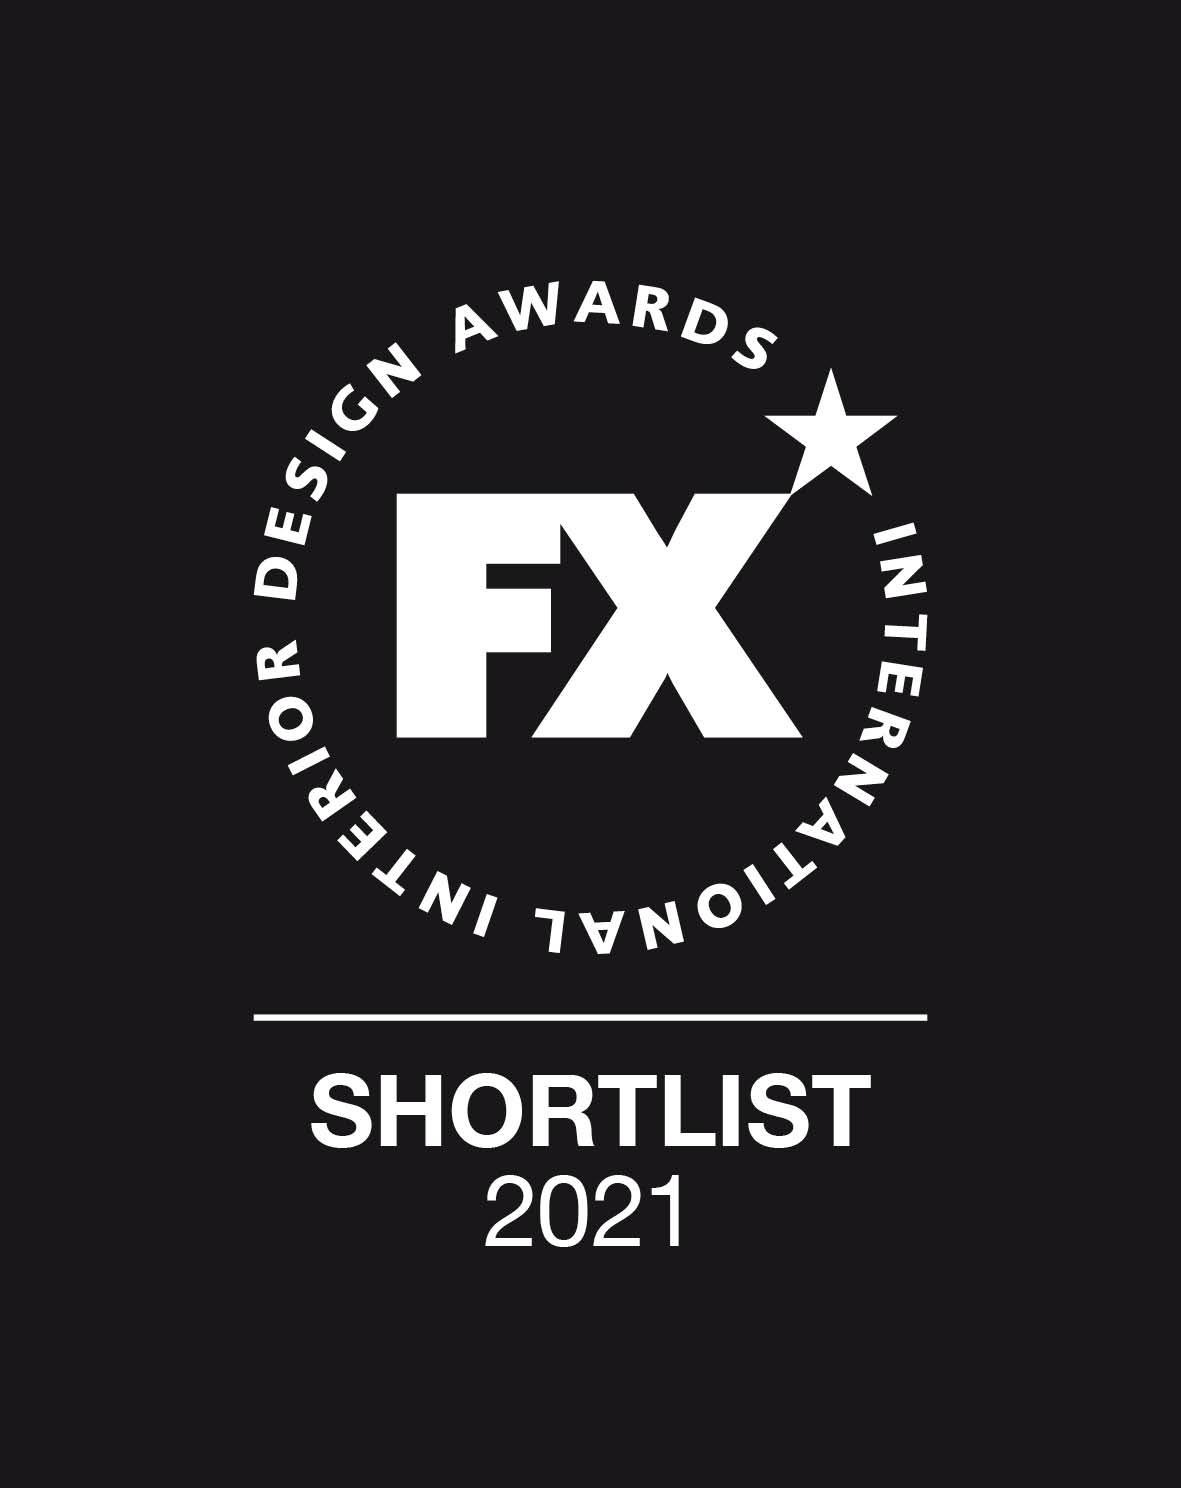 Image of FX Awards Shortlist 2021 black in FX International Interior Design Awards Recognises Silestone Sunlit Days as a Finalist - Cosentino